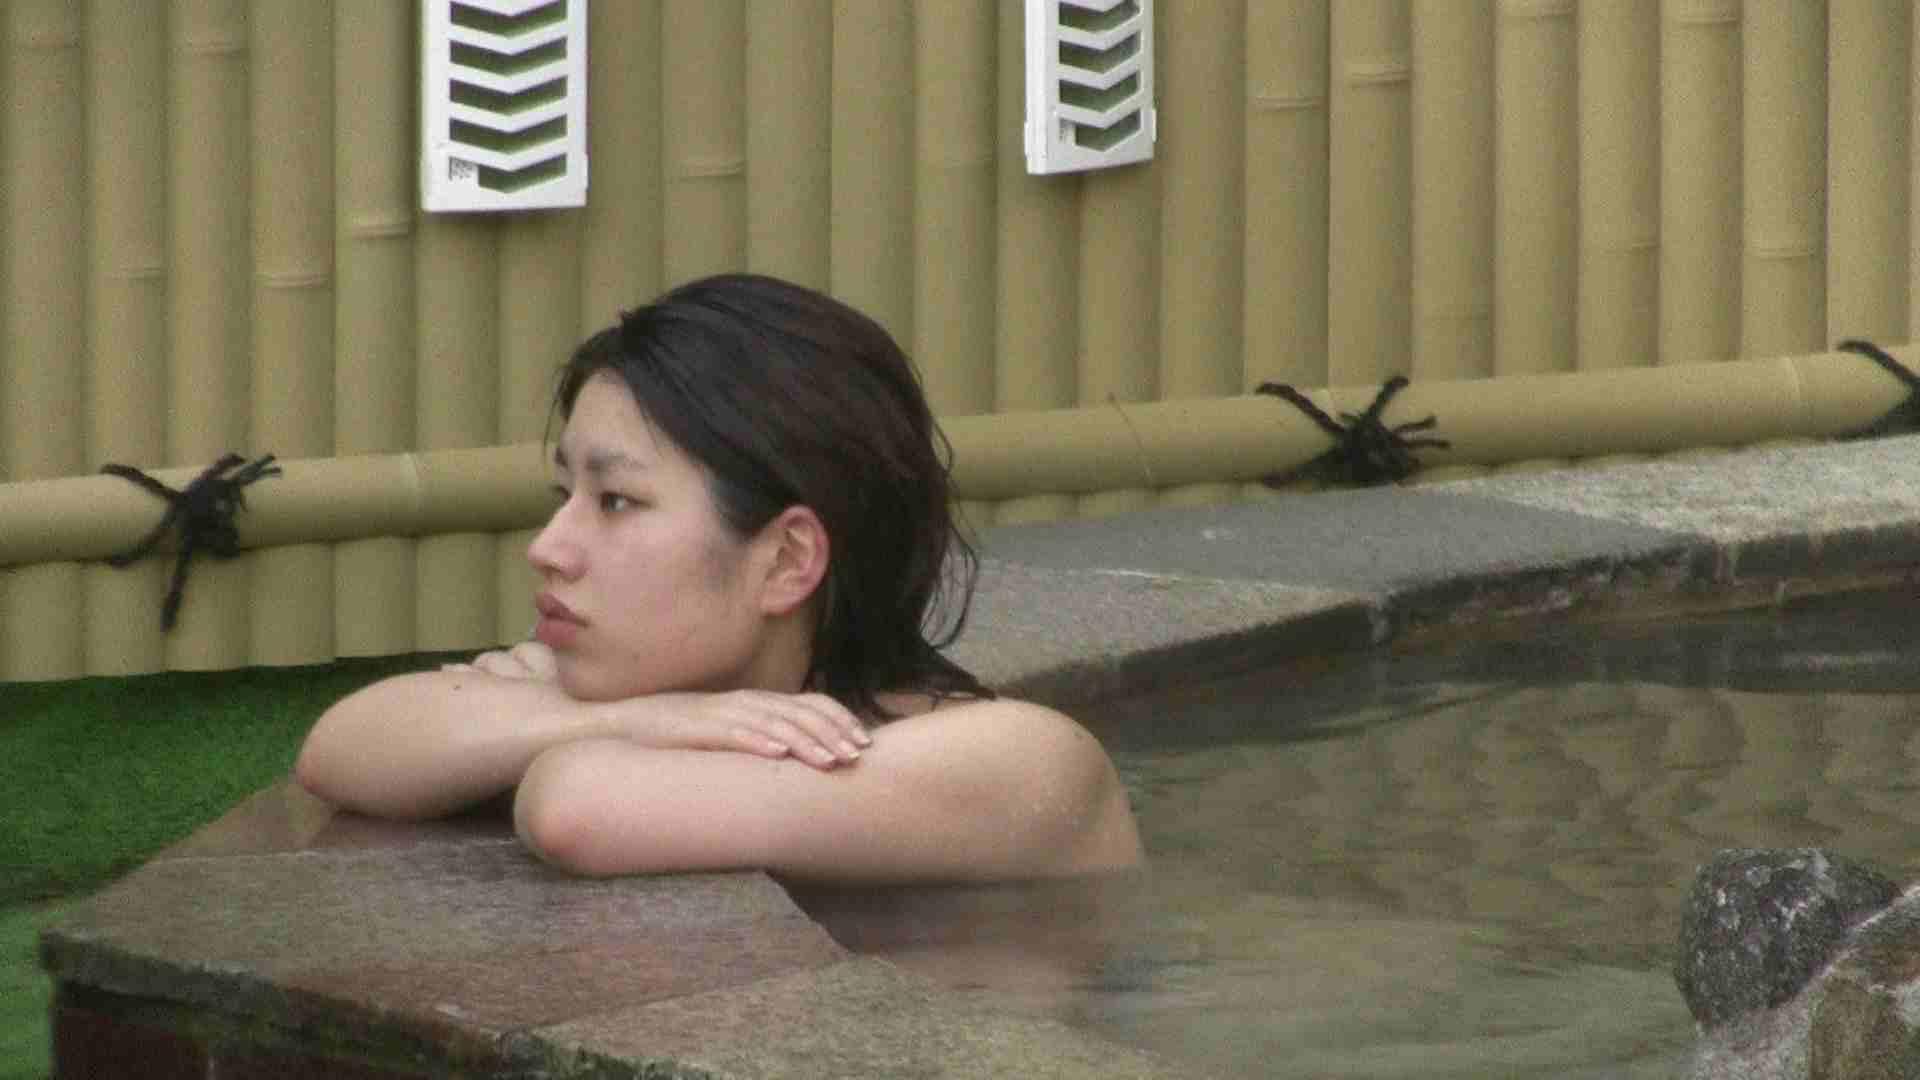 Aquaな露天風呂Vol.230 HなOL | 盗撮  83pic 18